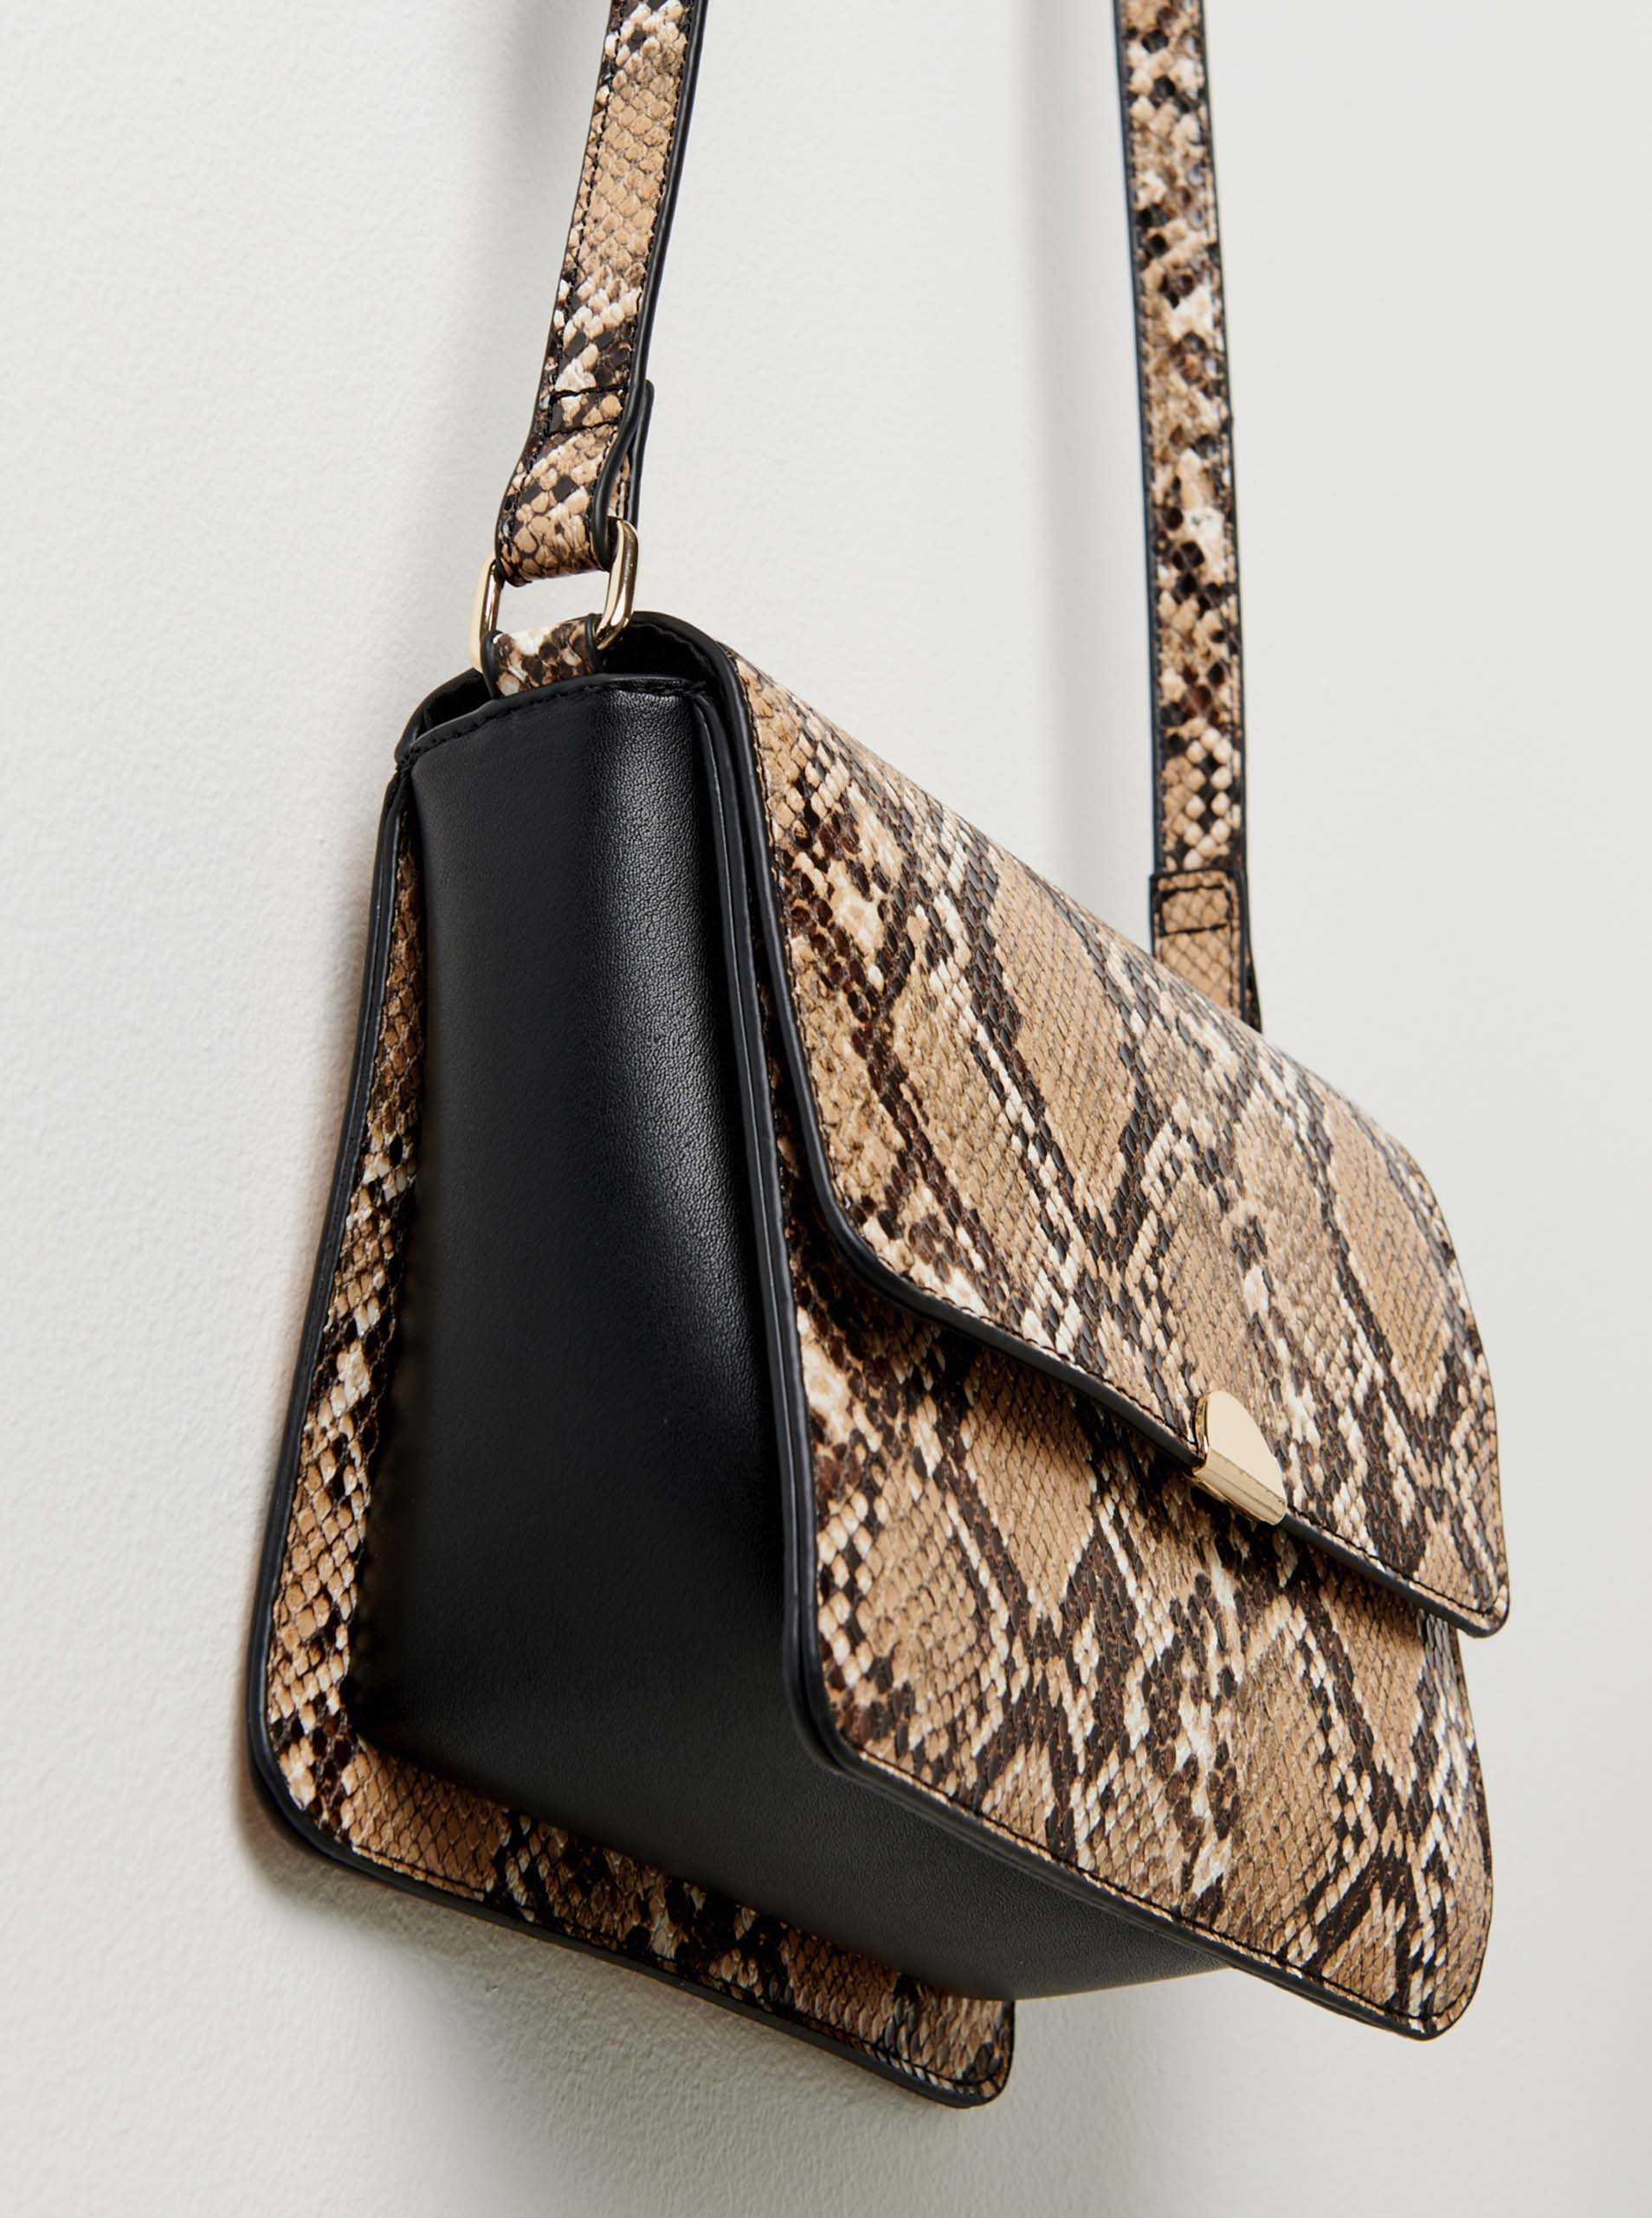 Hnědá crossbody kabelka s hadím vzorem CAMAIEU